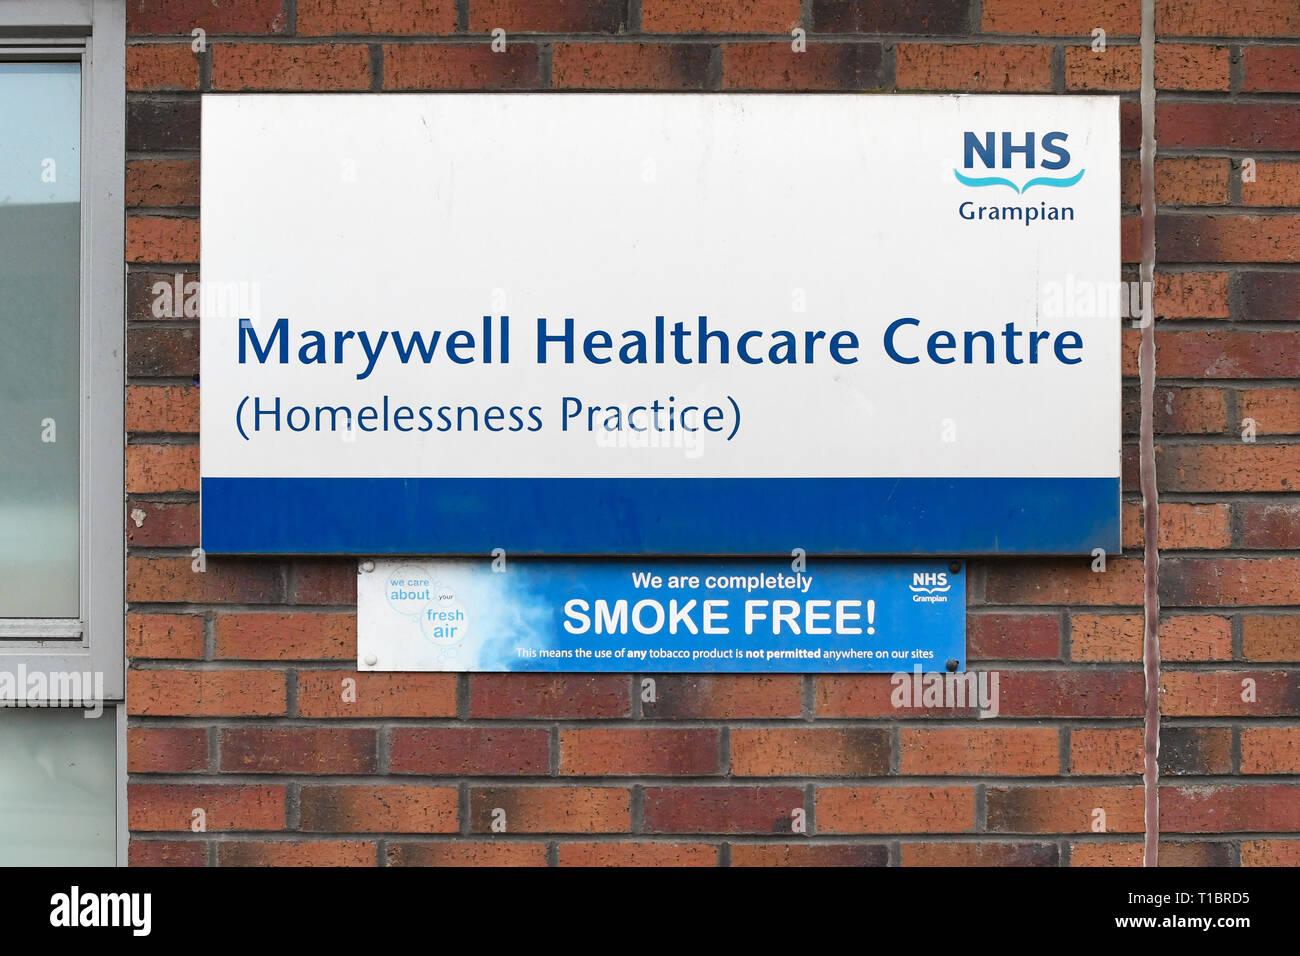 Marywell Heathcare Centre Homelessness Practice, Aberdeen, Scotland, UK - Stock Image